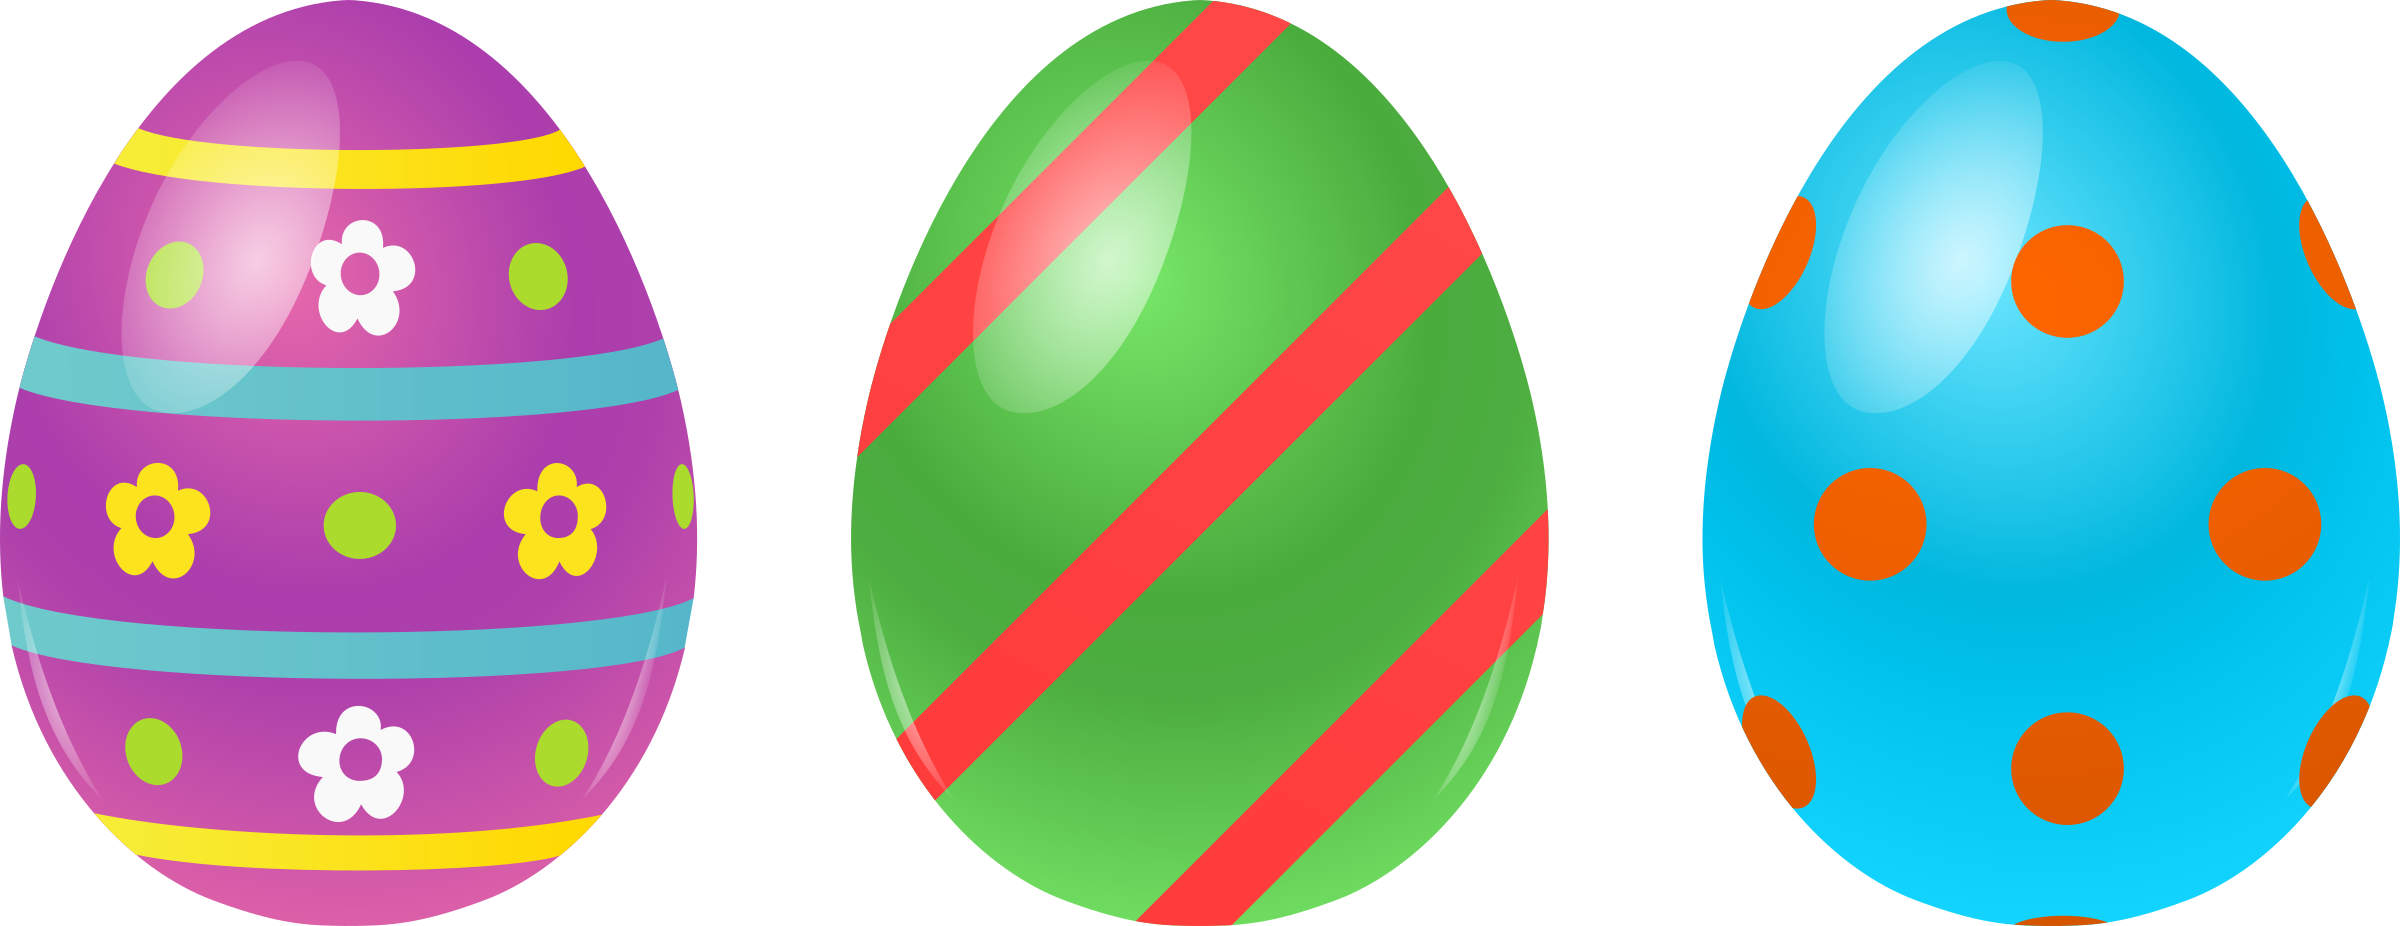 . ClipartLook.com Easter Eggs ClipartLook.com